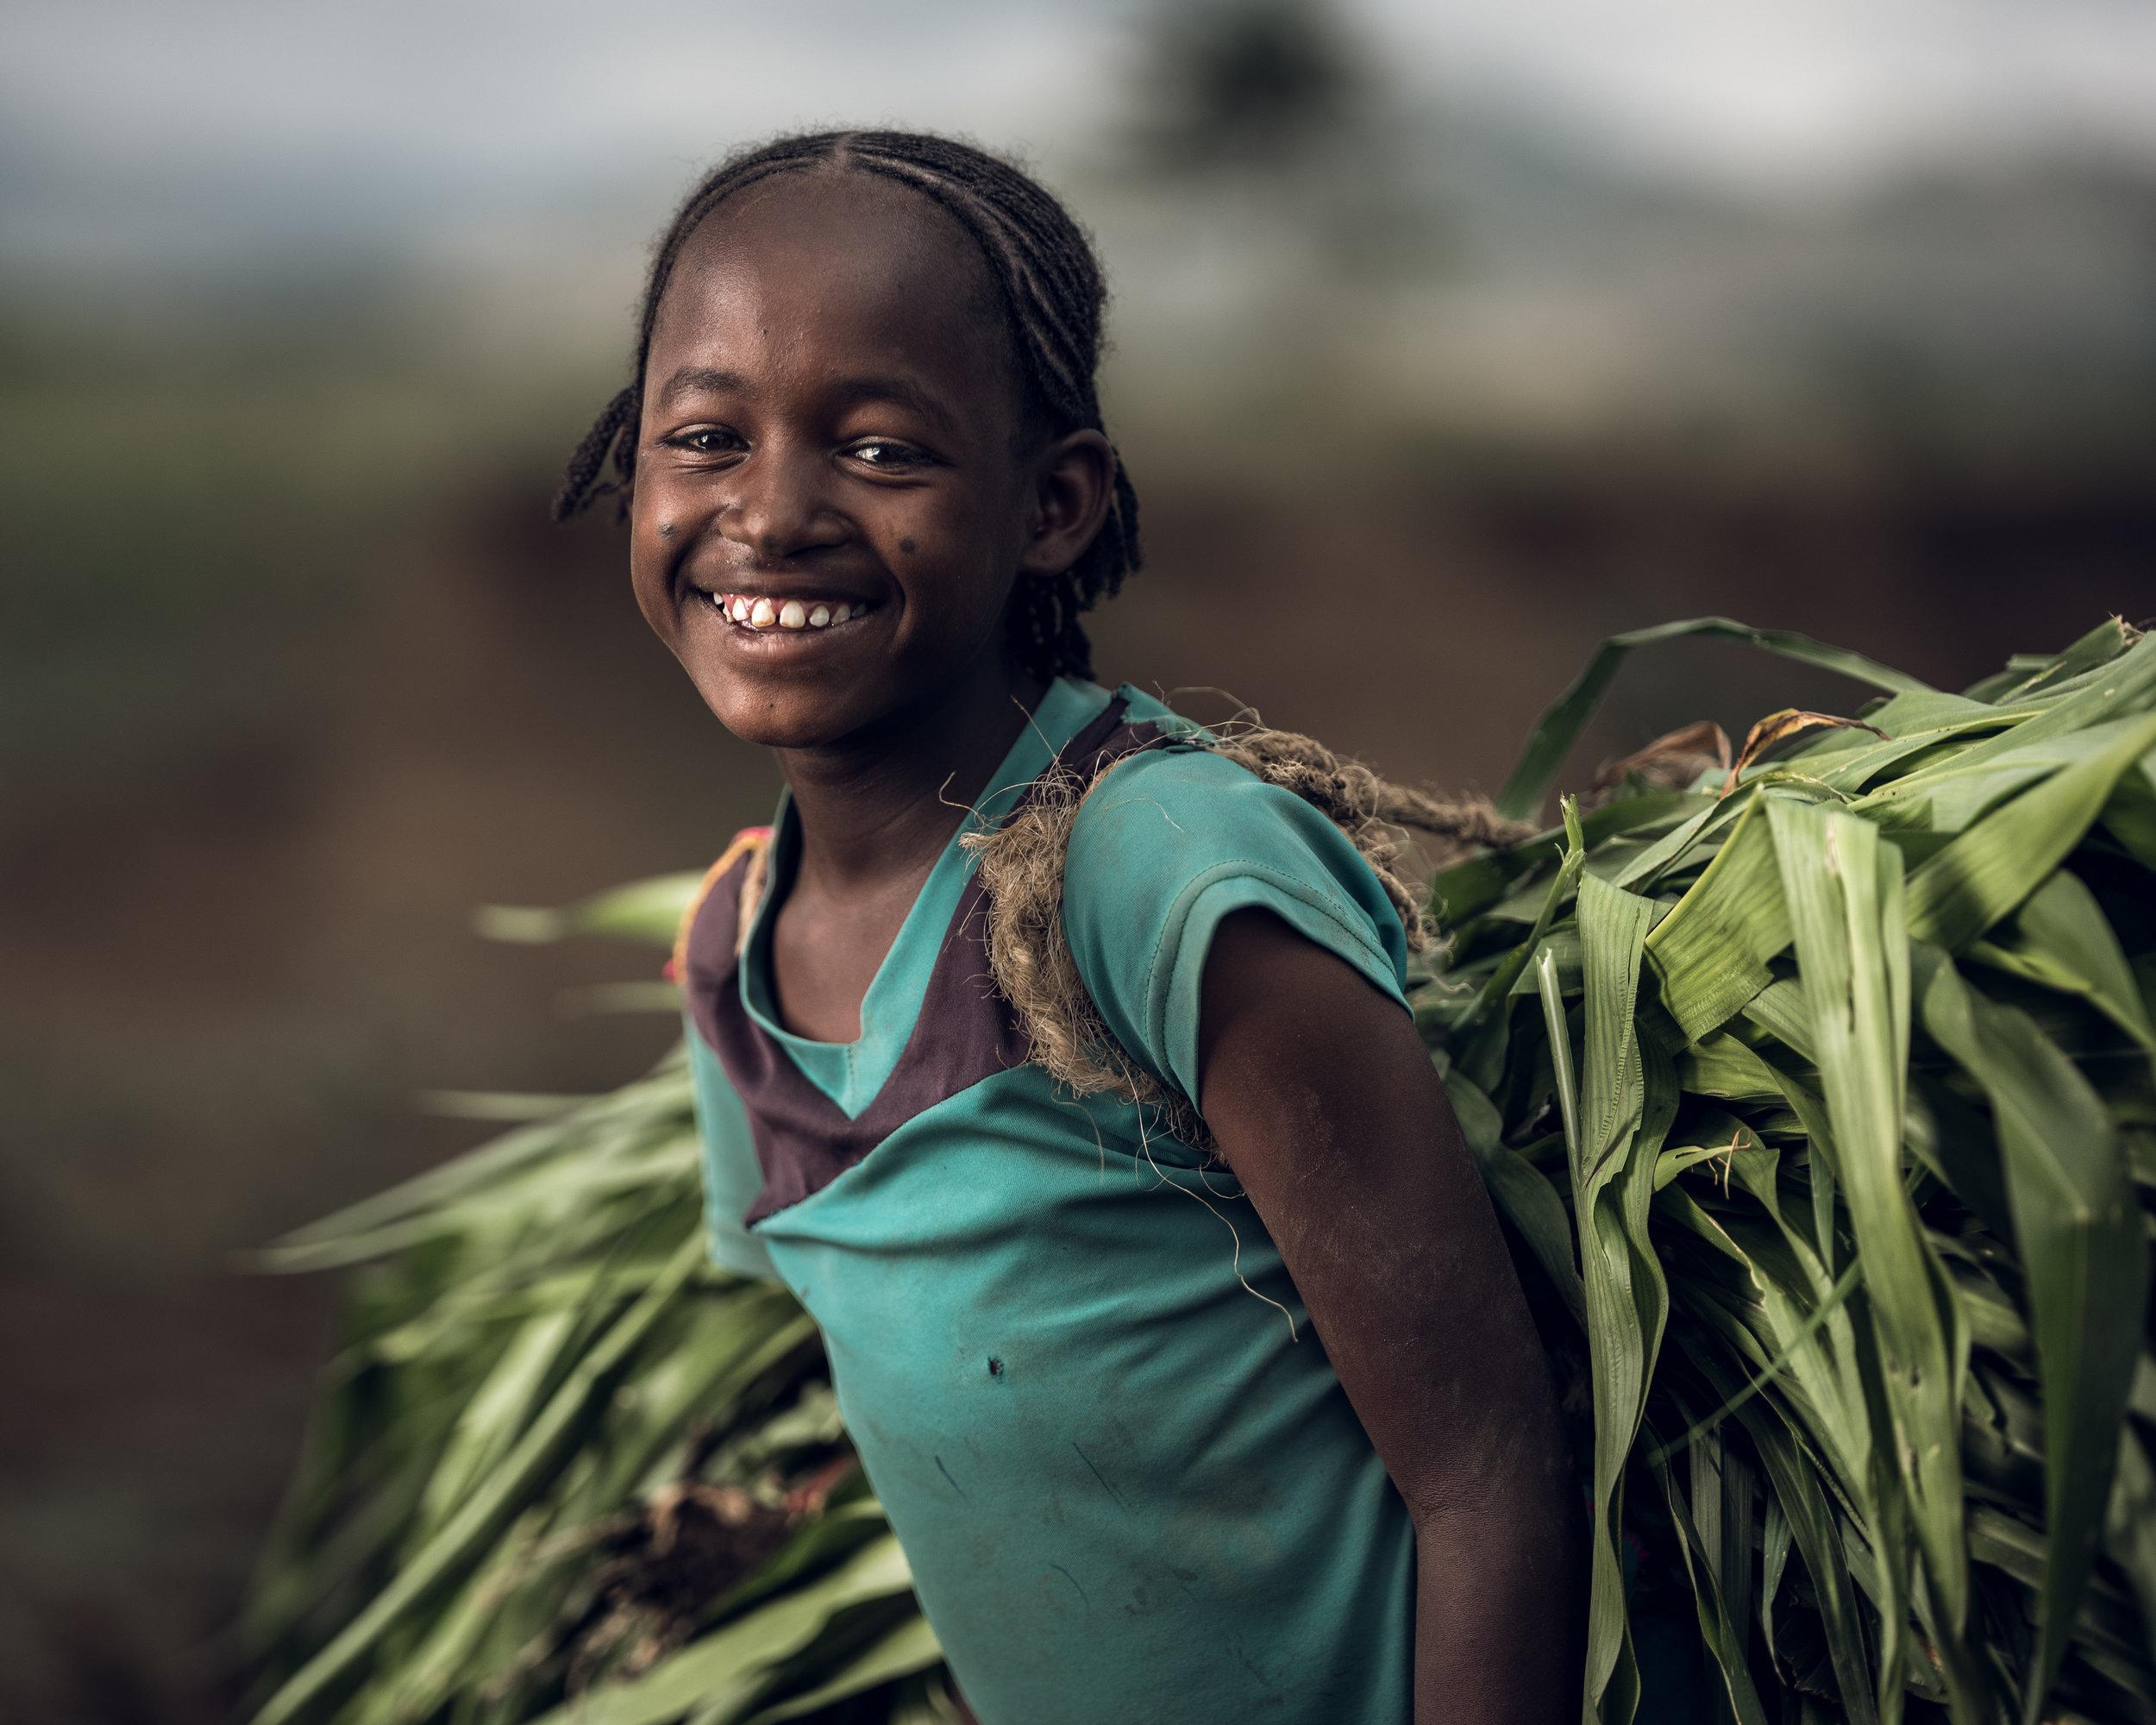 Ethiopia-Starling-PietVandenEynde_002.jpg